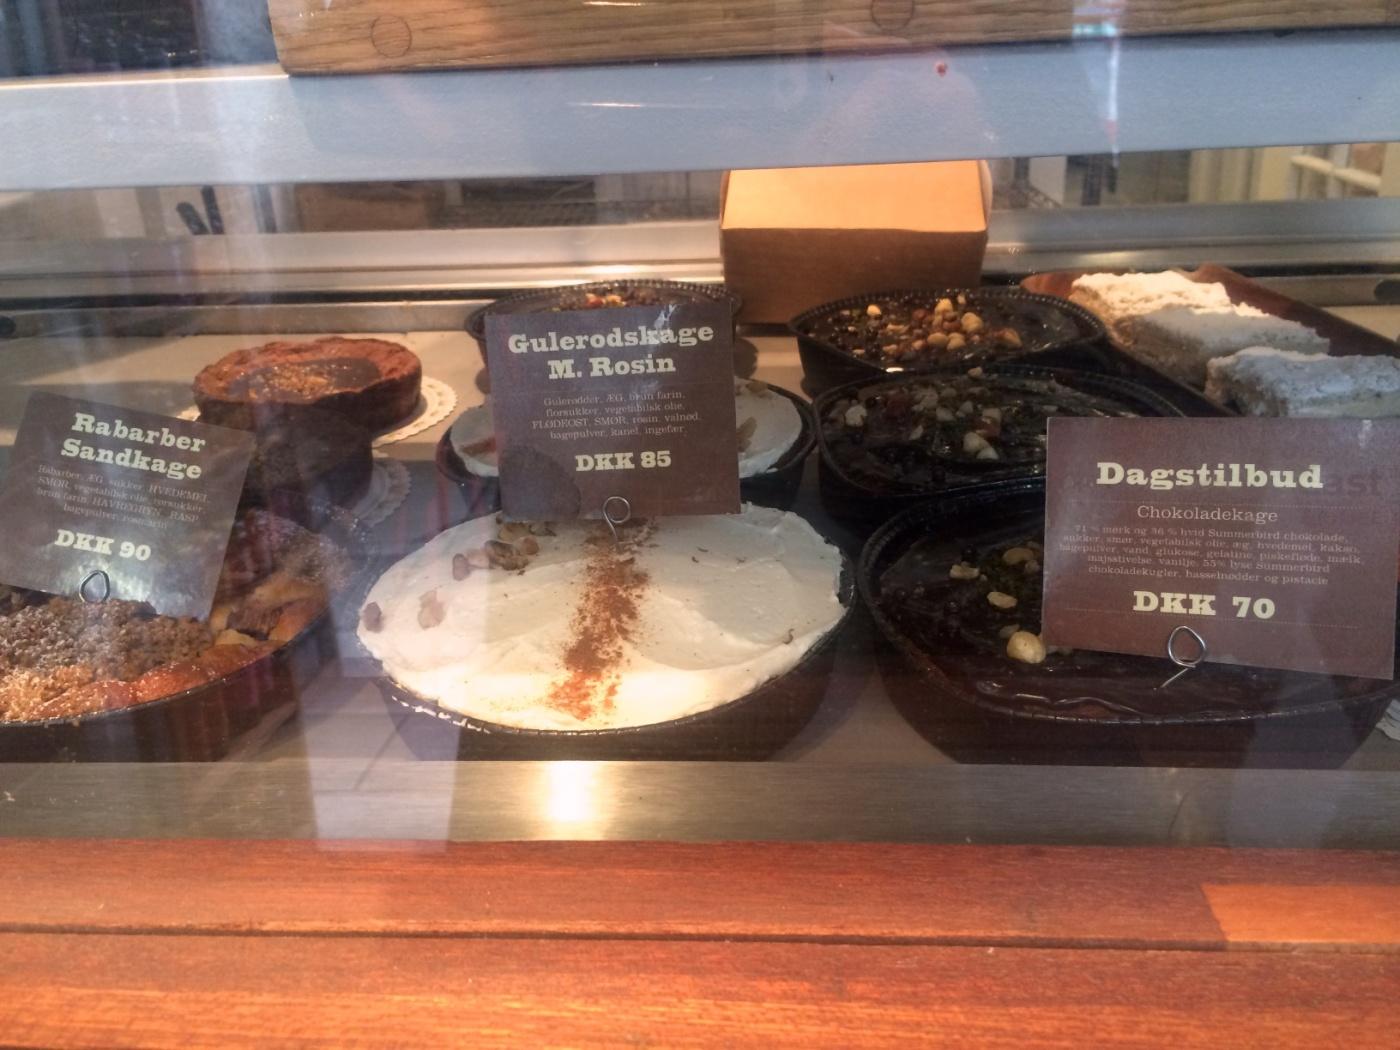 Rhubarb cake, carrot cake, chocolate